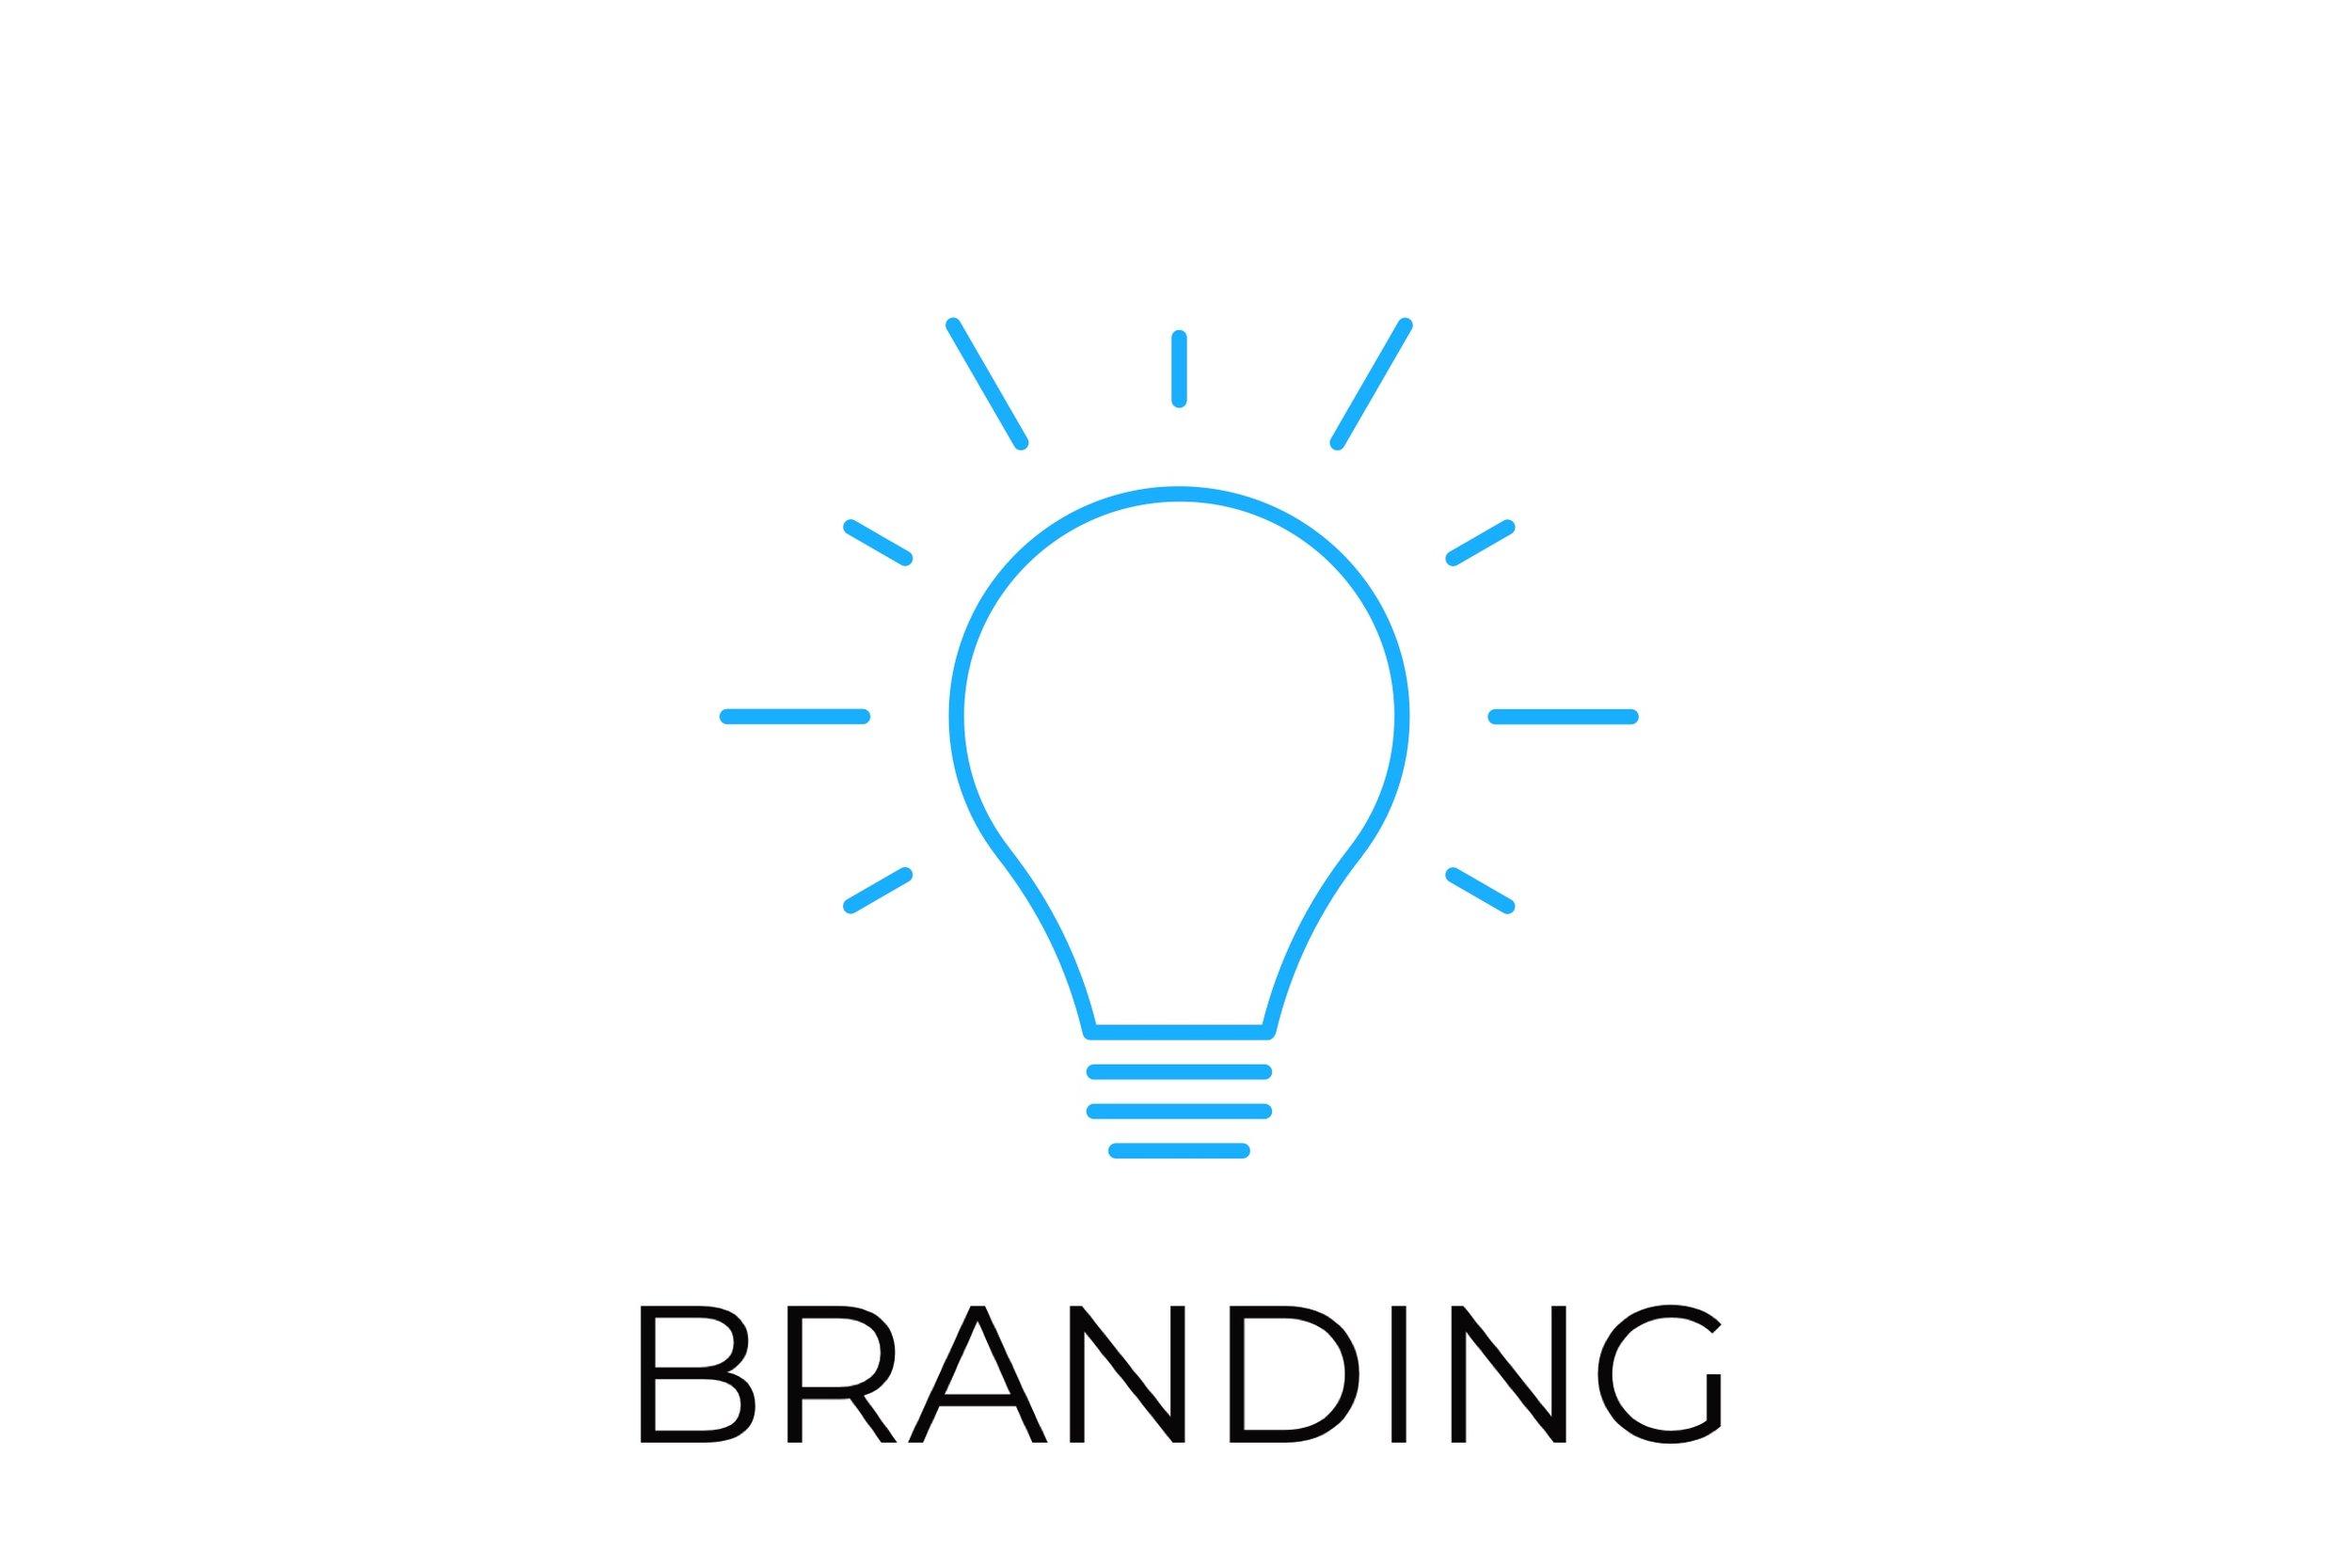 branding.jpeg